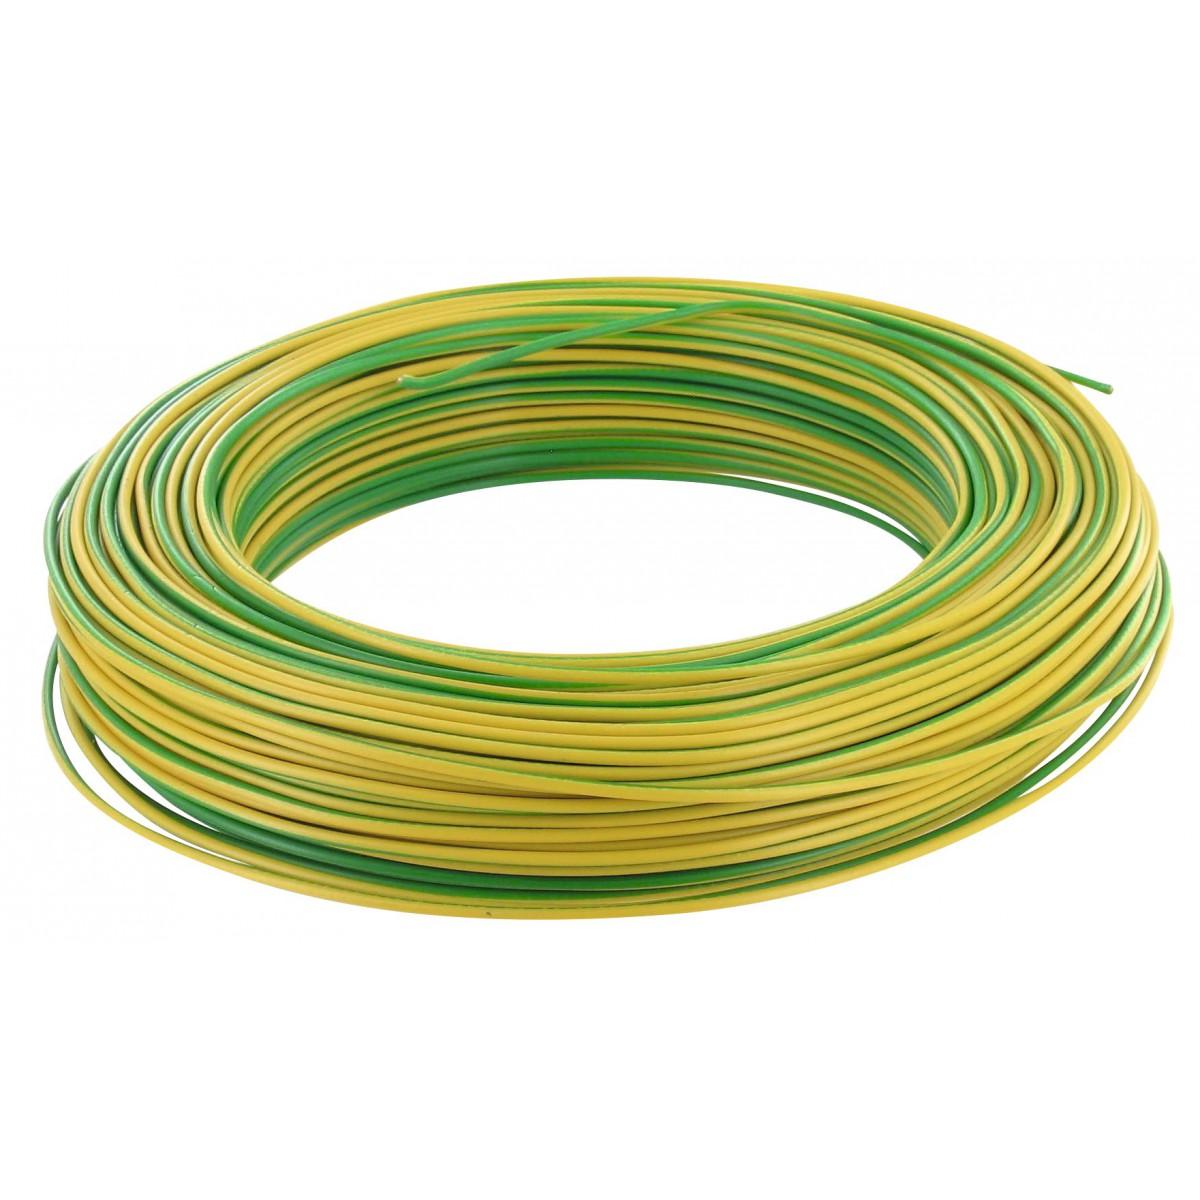 Fil H07 V-U 2,5 mm² - Couronne 100 m - Vert / jaune